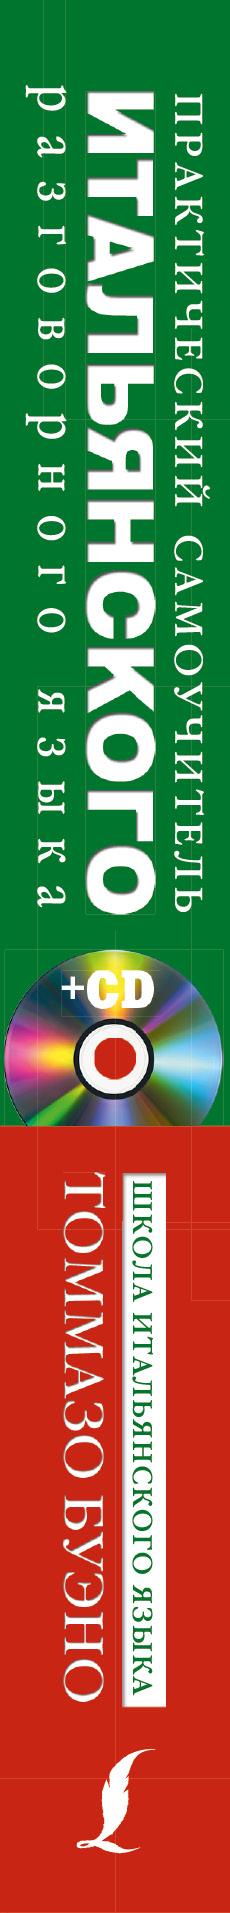 ����������� ����. ������������ ����������� (+ ��������� CD)